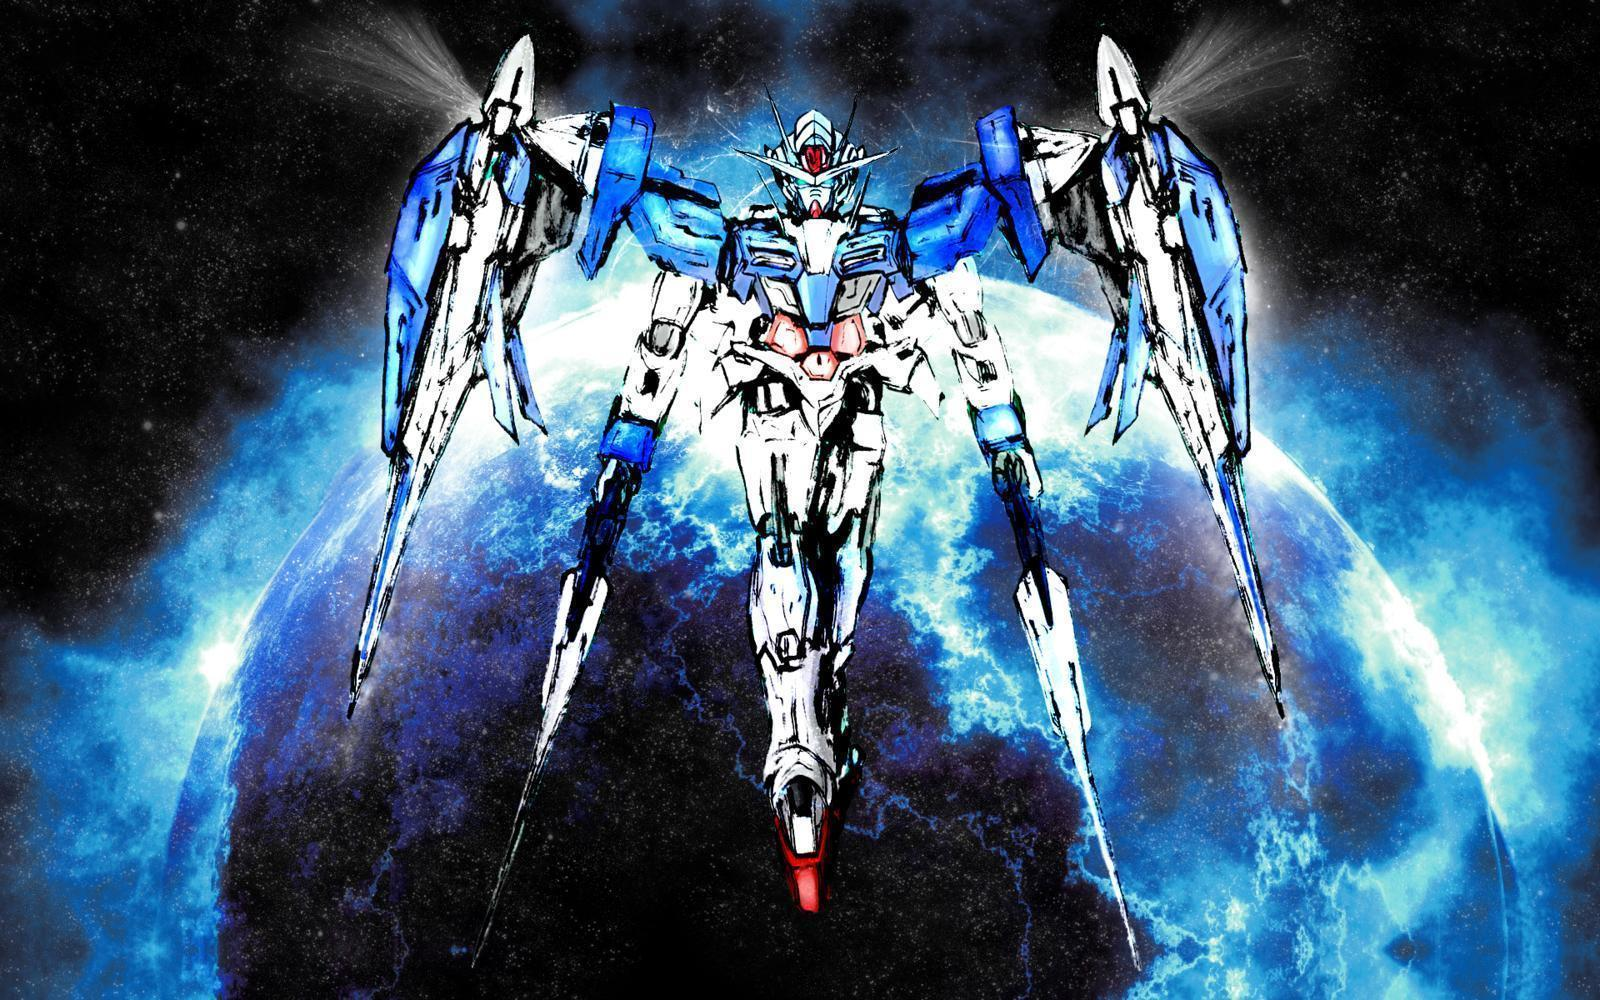 Gundam 00 Hd Wallpapers Wallpaper Cave